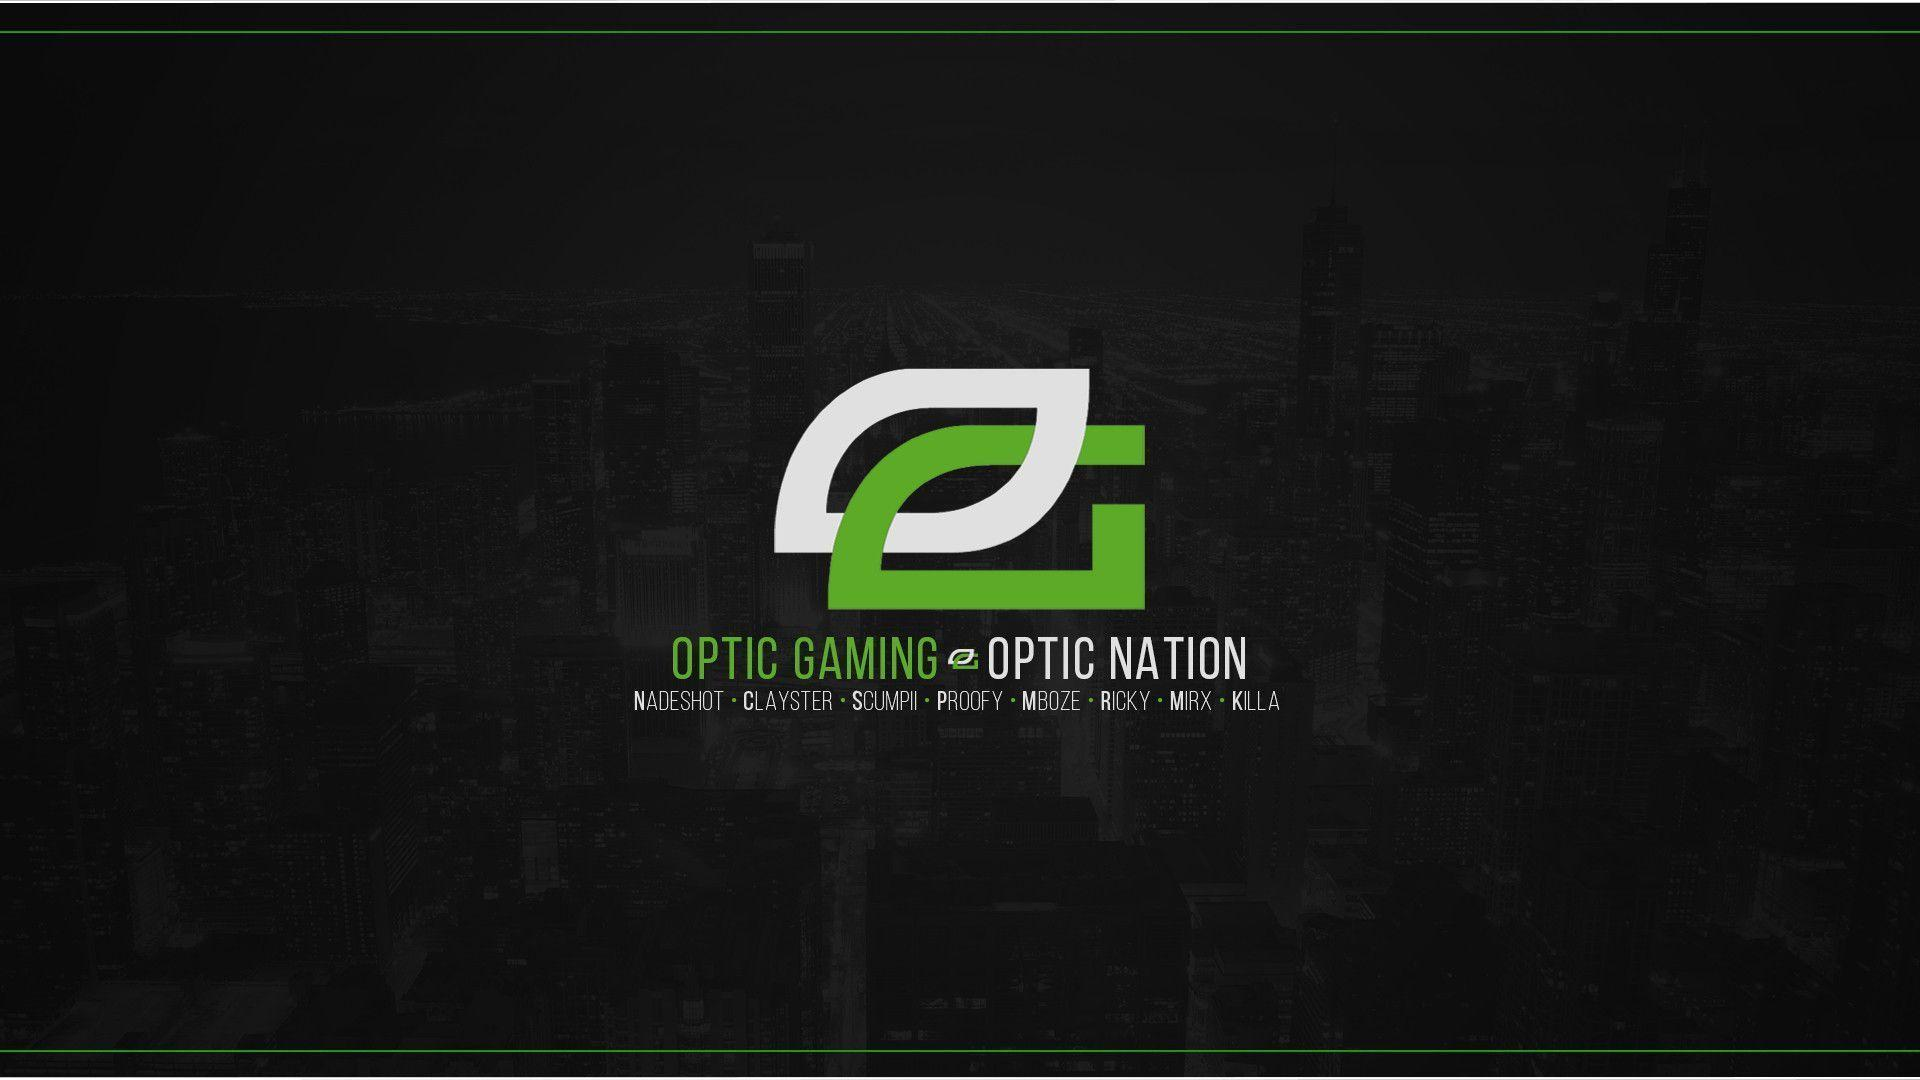 optic gaming wallpaper6 - photo #5